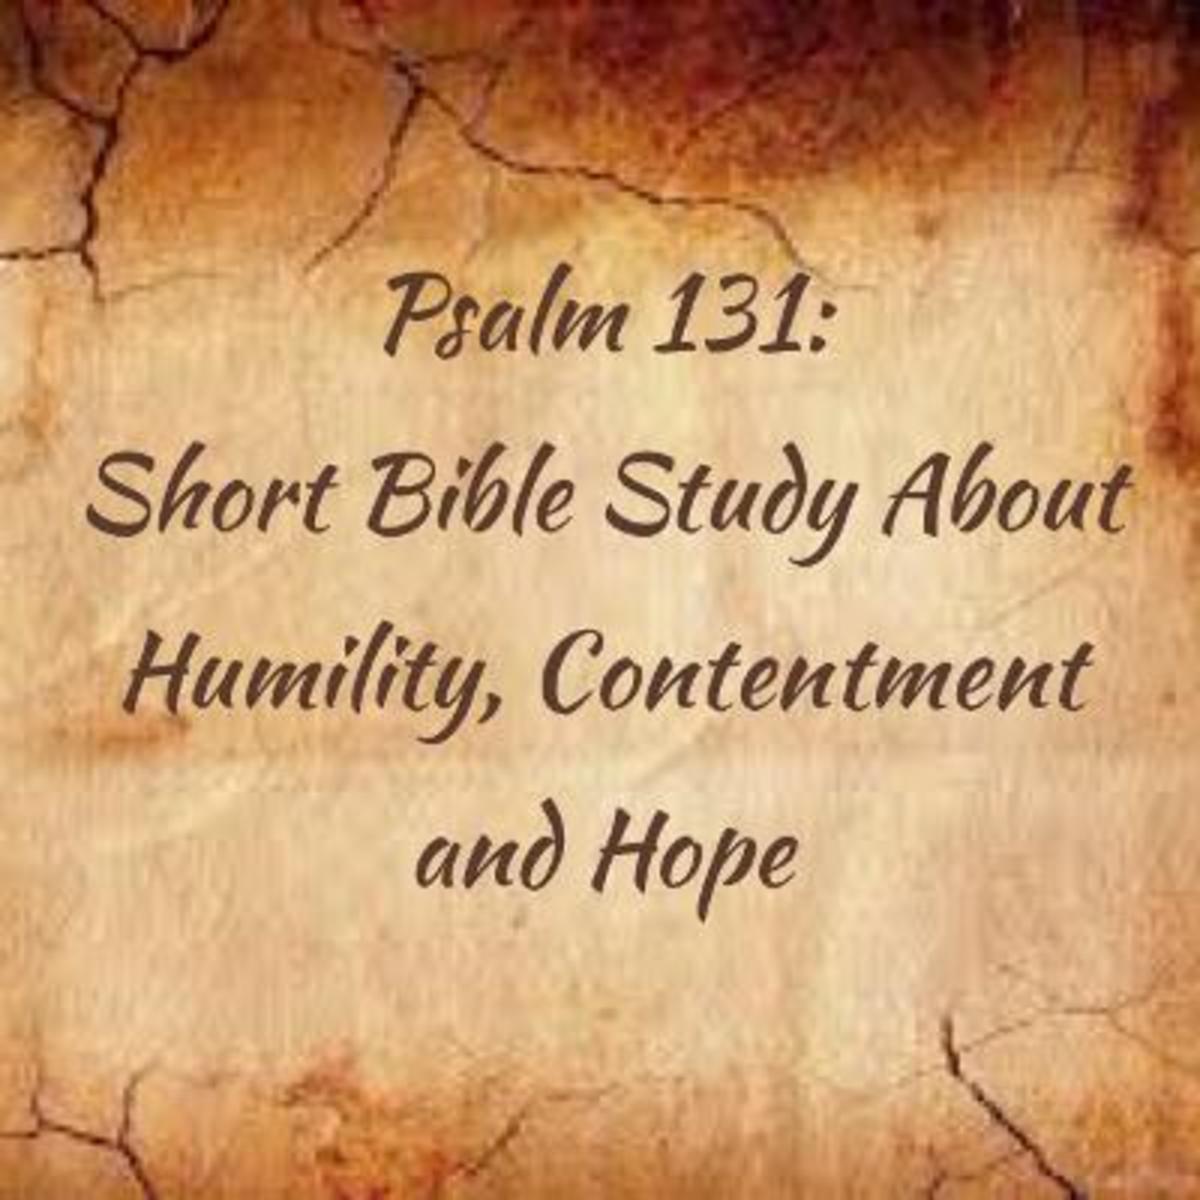 psalm-131-davids-short-psalm-about-hope-and-a-quiet-spirit